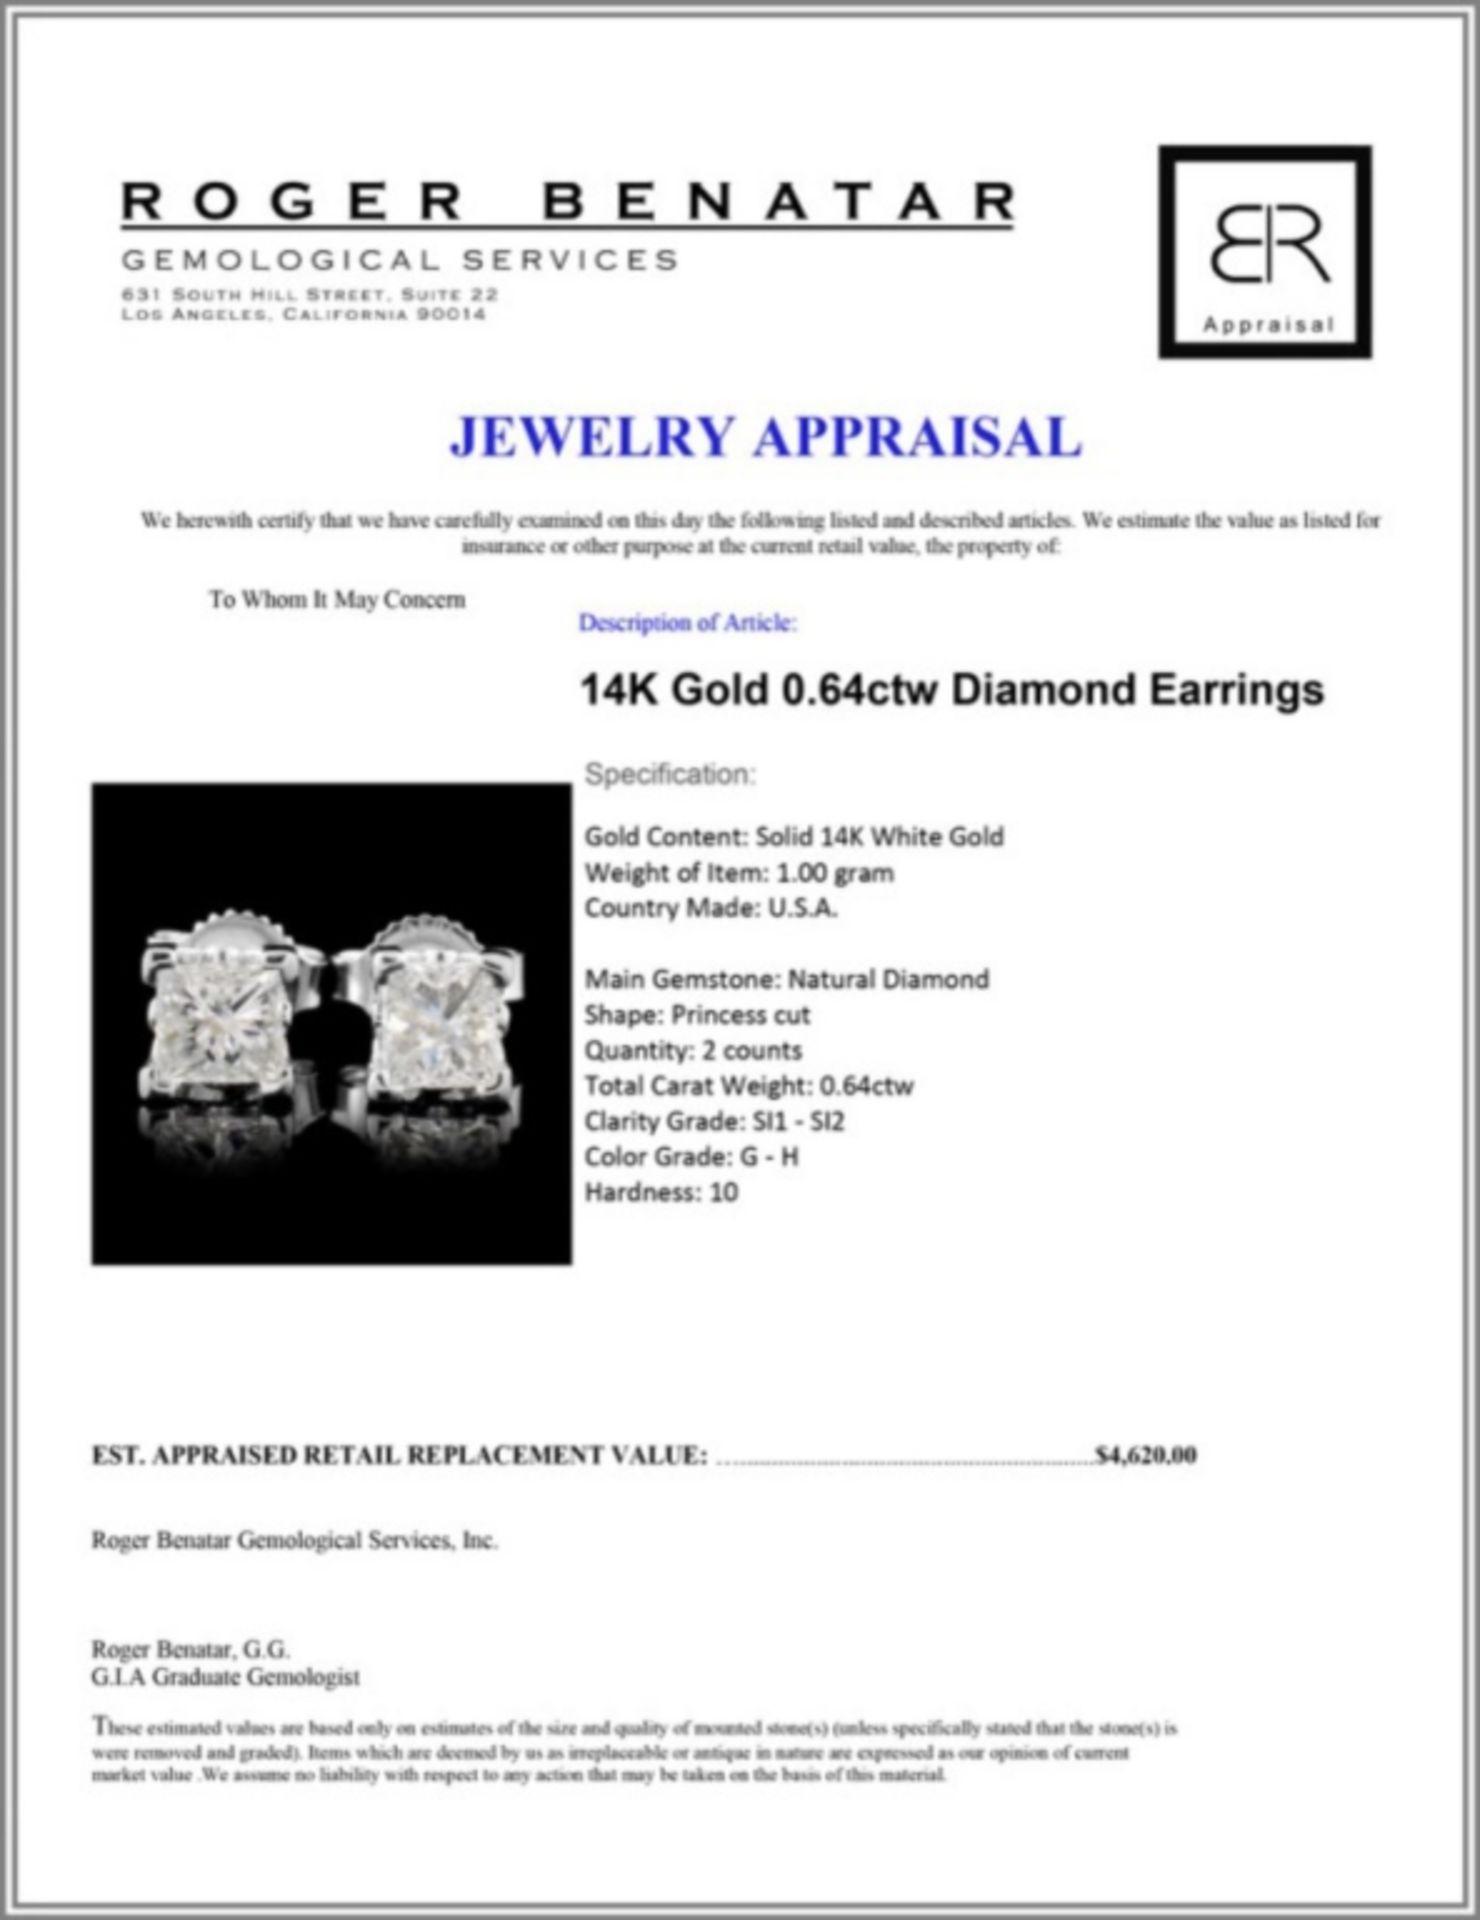 14K Gold 0.64ctw Diamond Earrings - Image 3 of 3